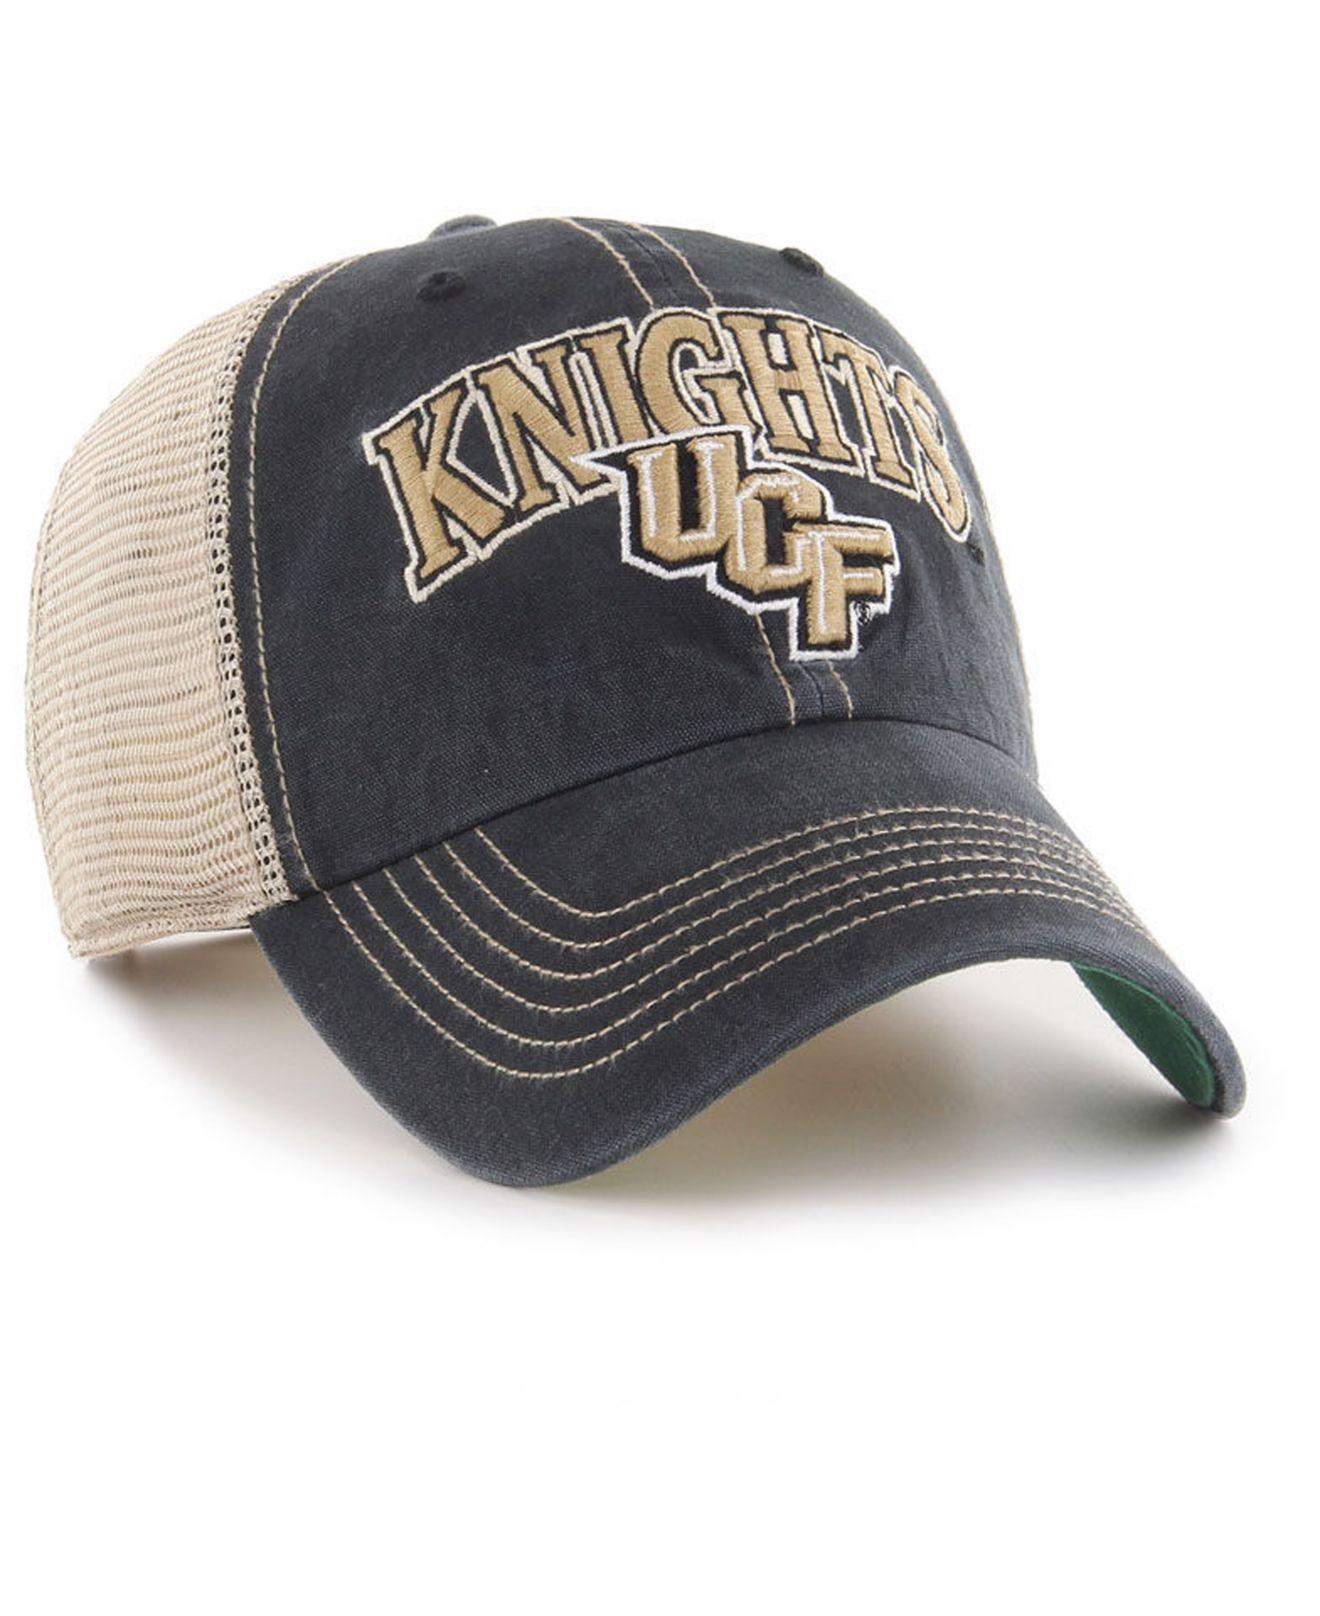 huge discount 71c3c b00fa ... Black University Of Central Florida Knights Tuscaloosa Mesh Clean Up Cap  for Men. View fullscreen